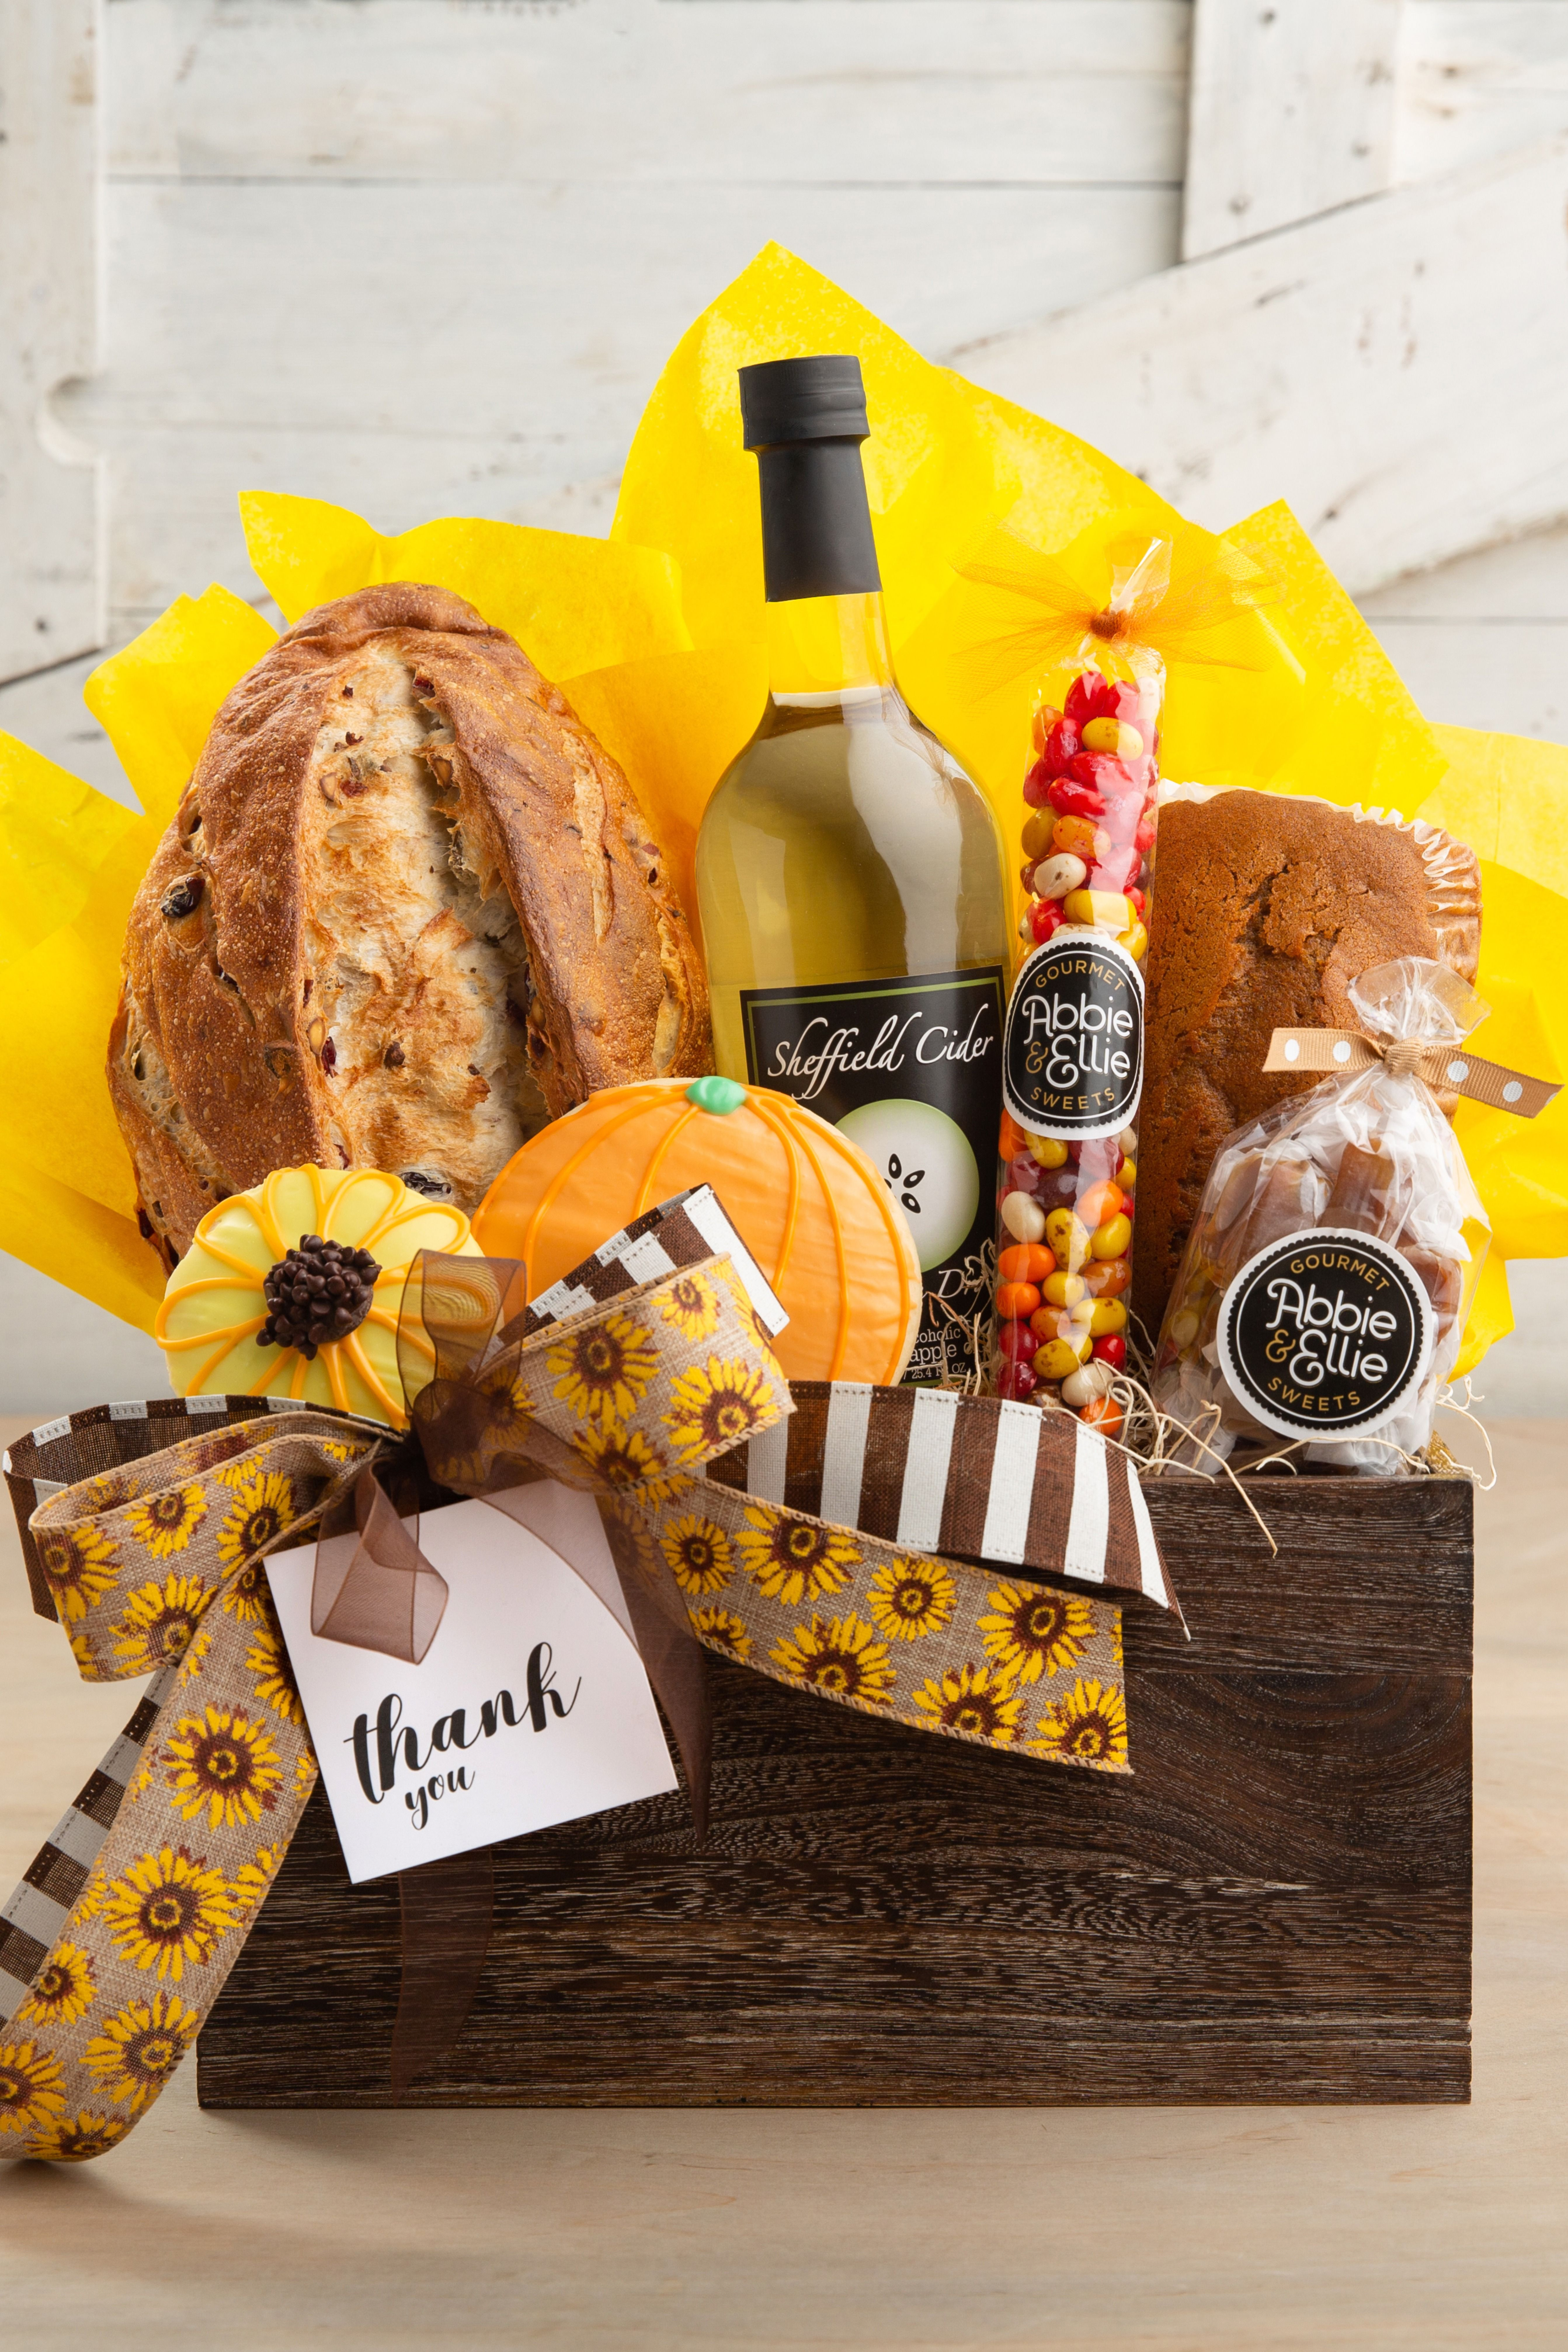 Sheffield Cafe Christmas Party 2020 Autumn Thank You Gift Basket | Pumpkin sugar cookies, Gourmet